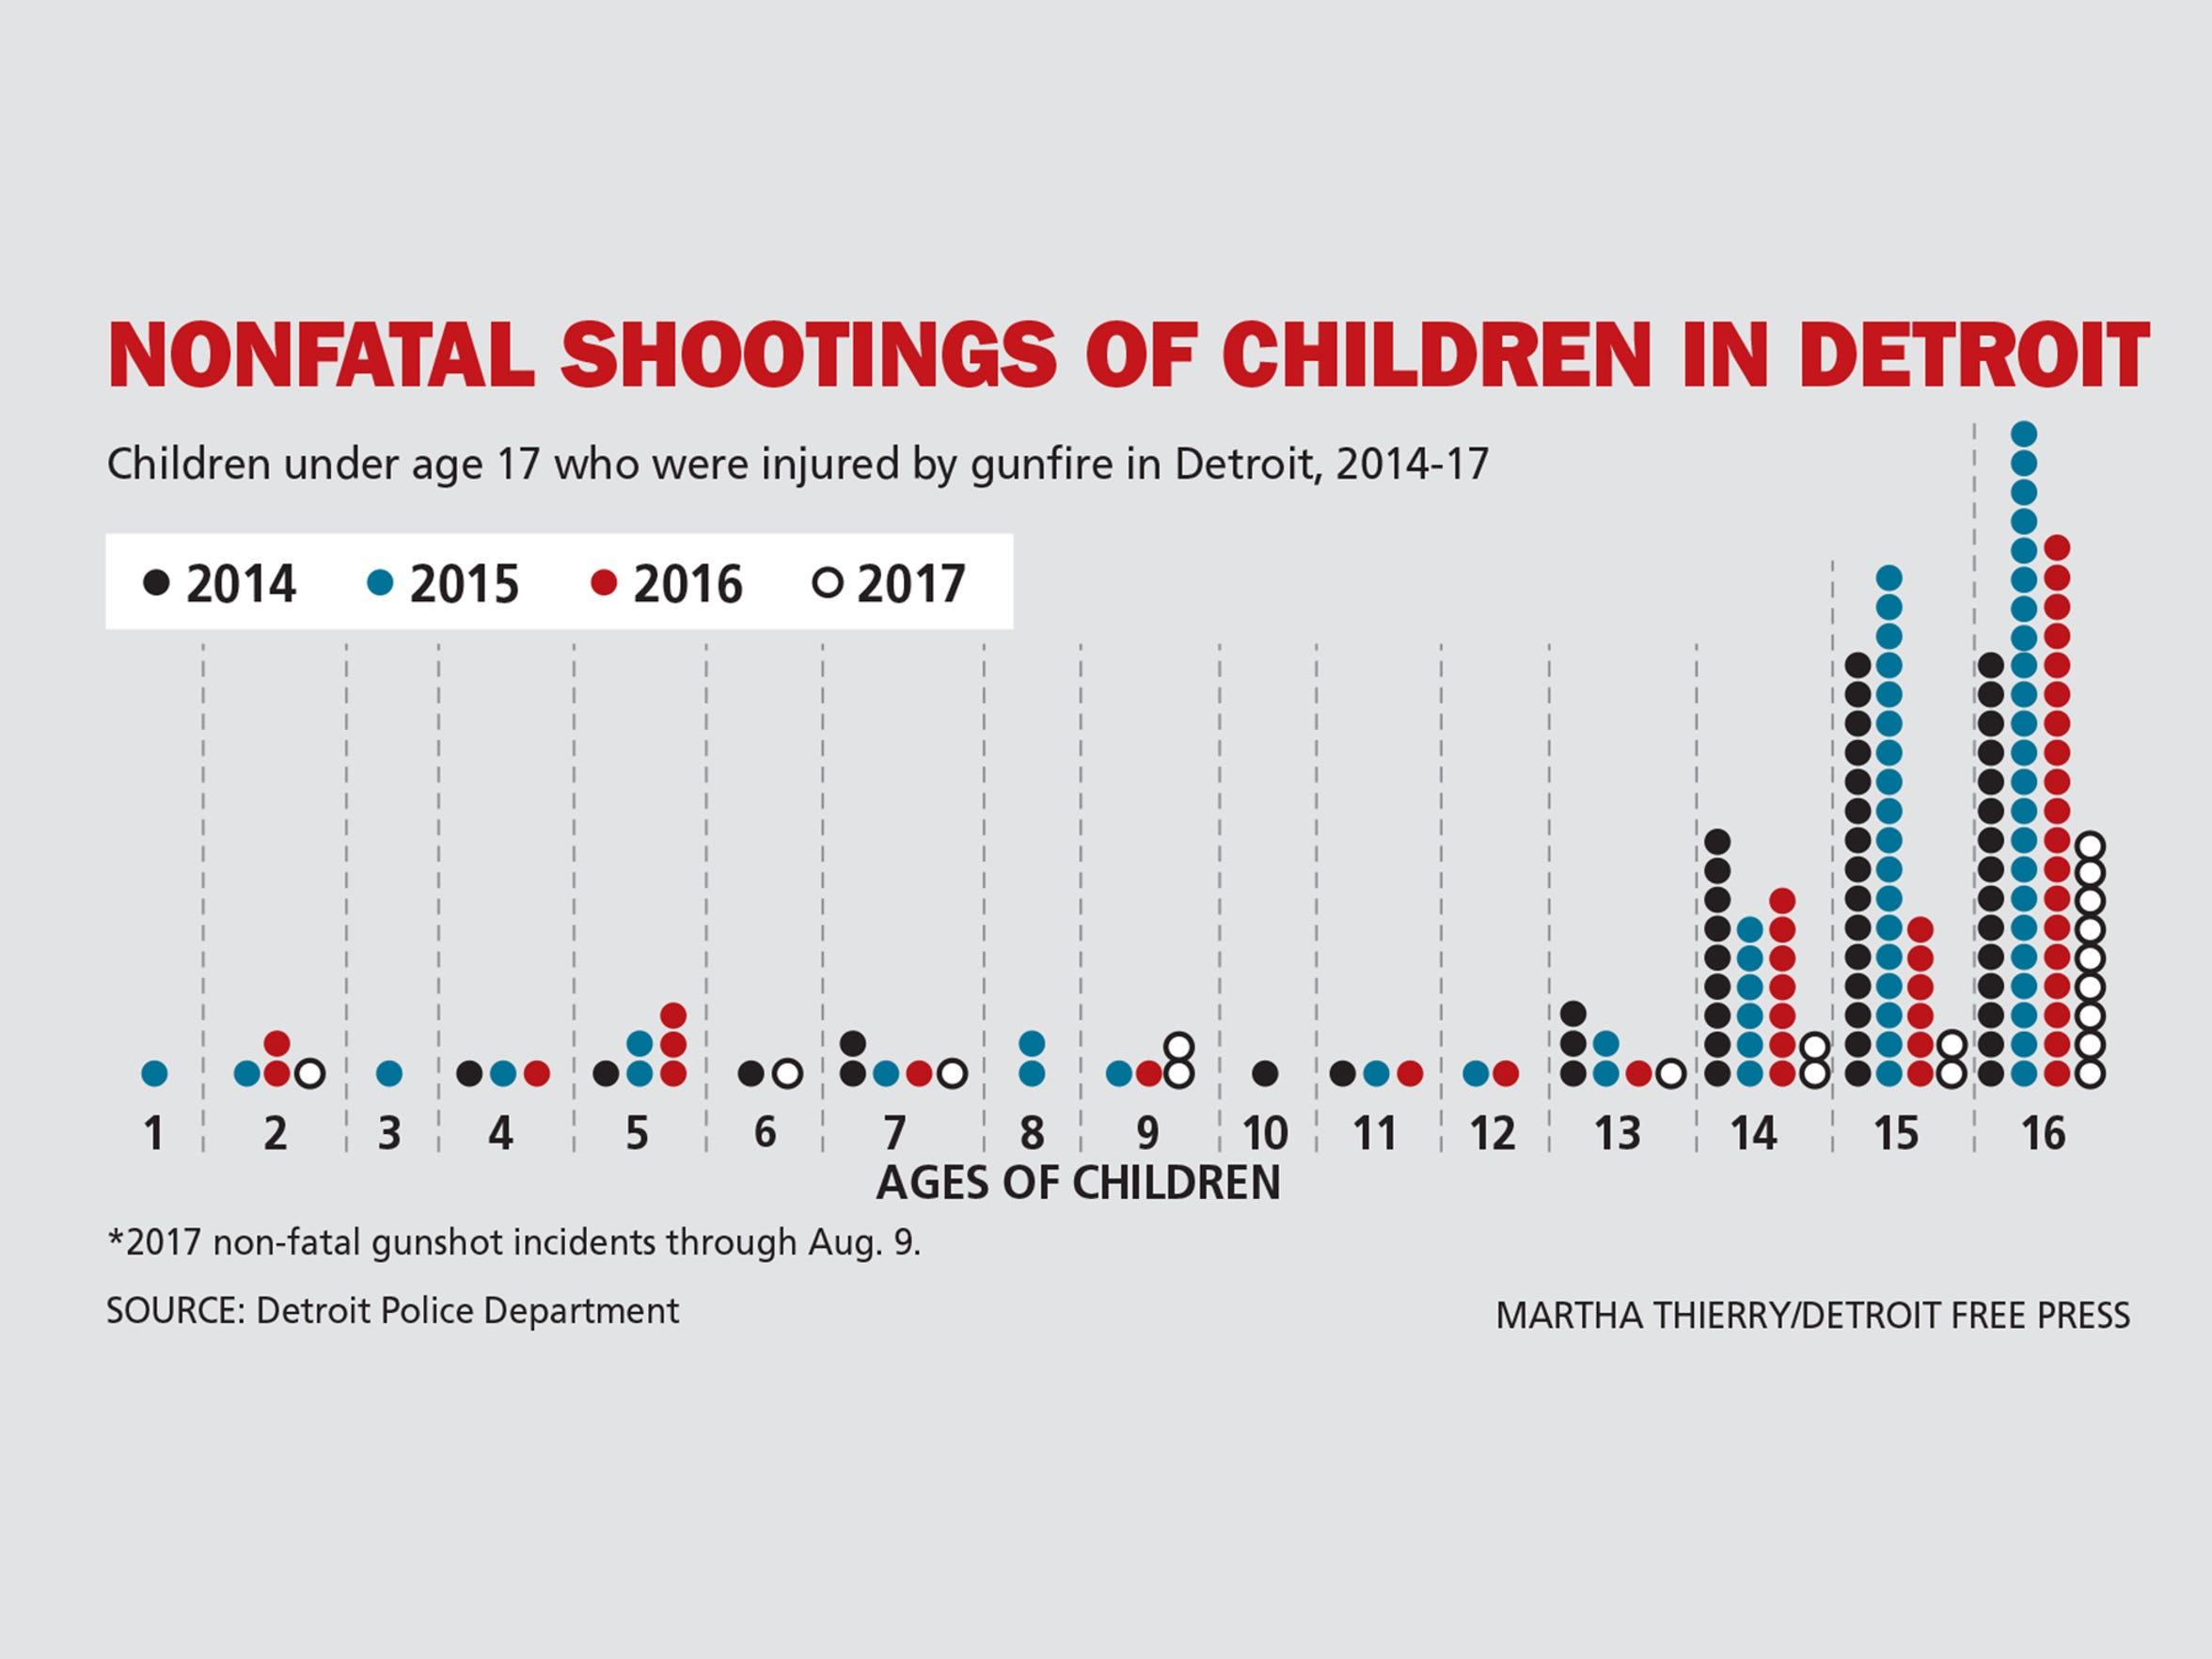 Nonfatal shootings of children in Detroit.